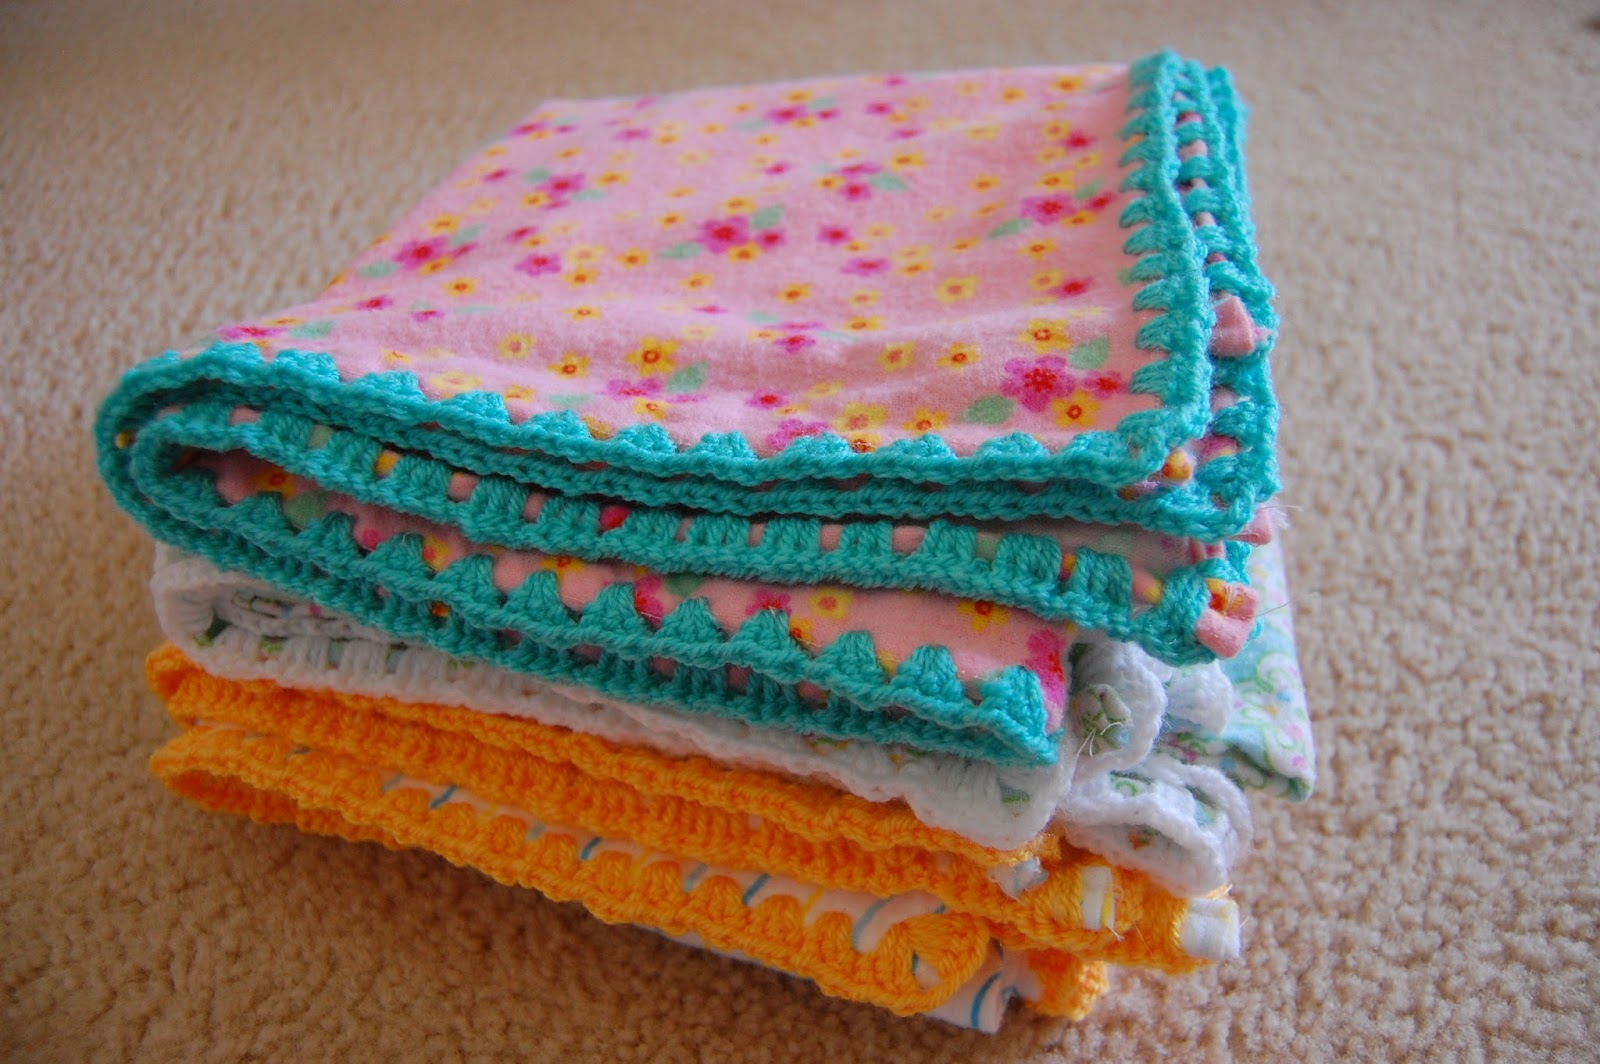 Flannel Baby Blanket Crochet Edging Patterns : thistlebear: Crochet-edged receiving blankets